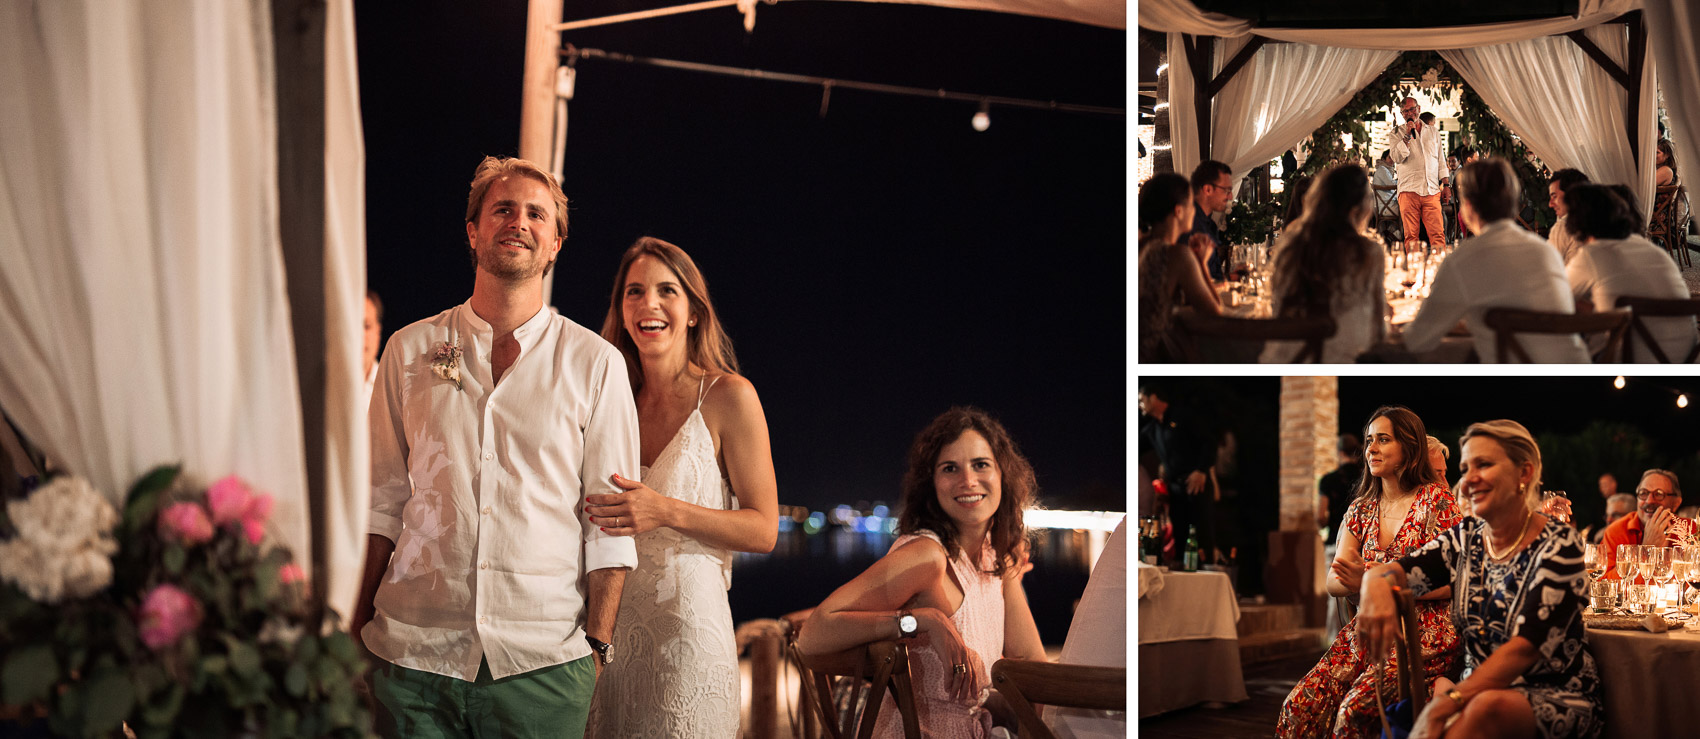 invitados wedding mesas restaurante luces pareja novios